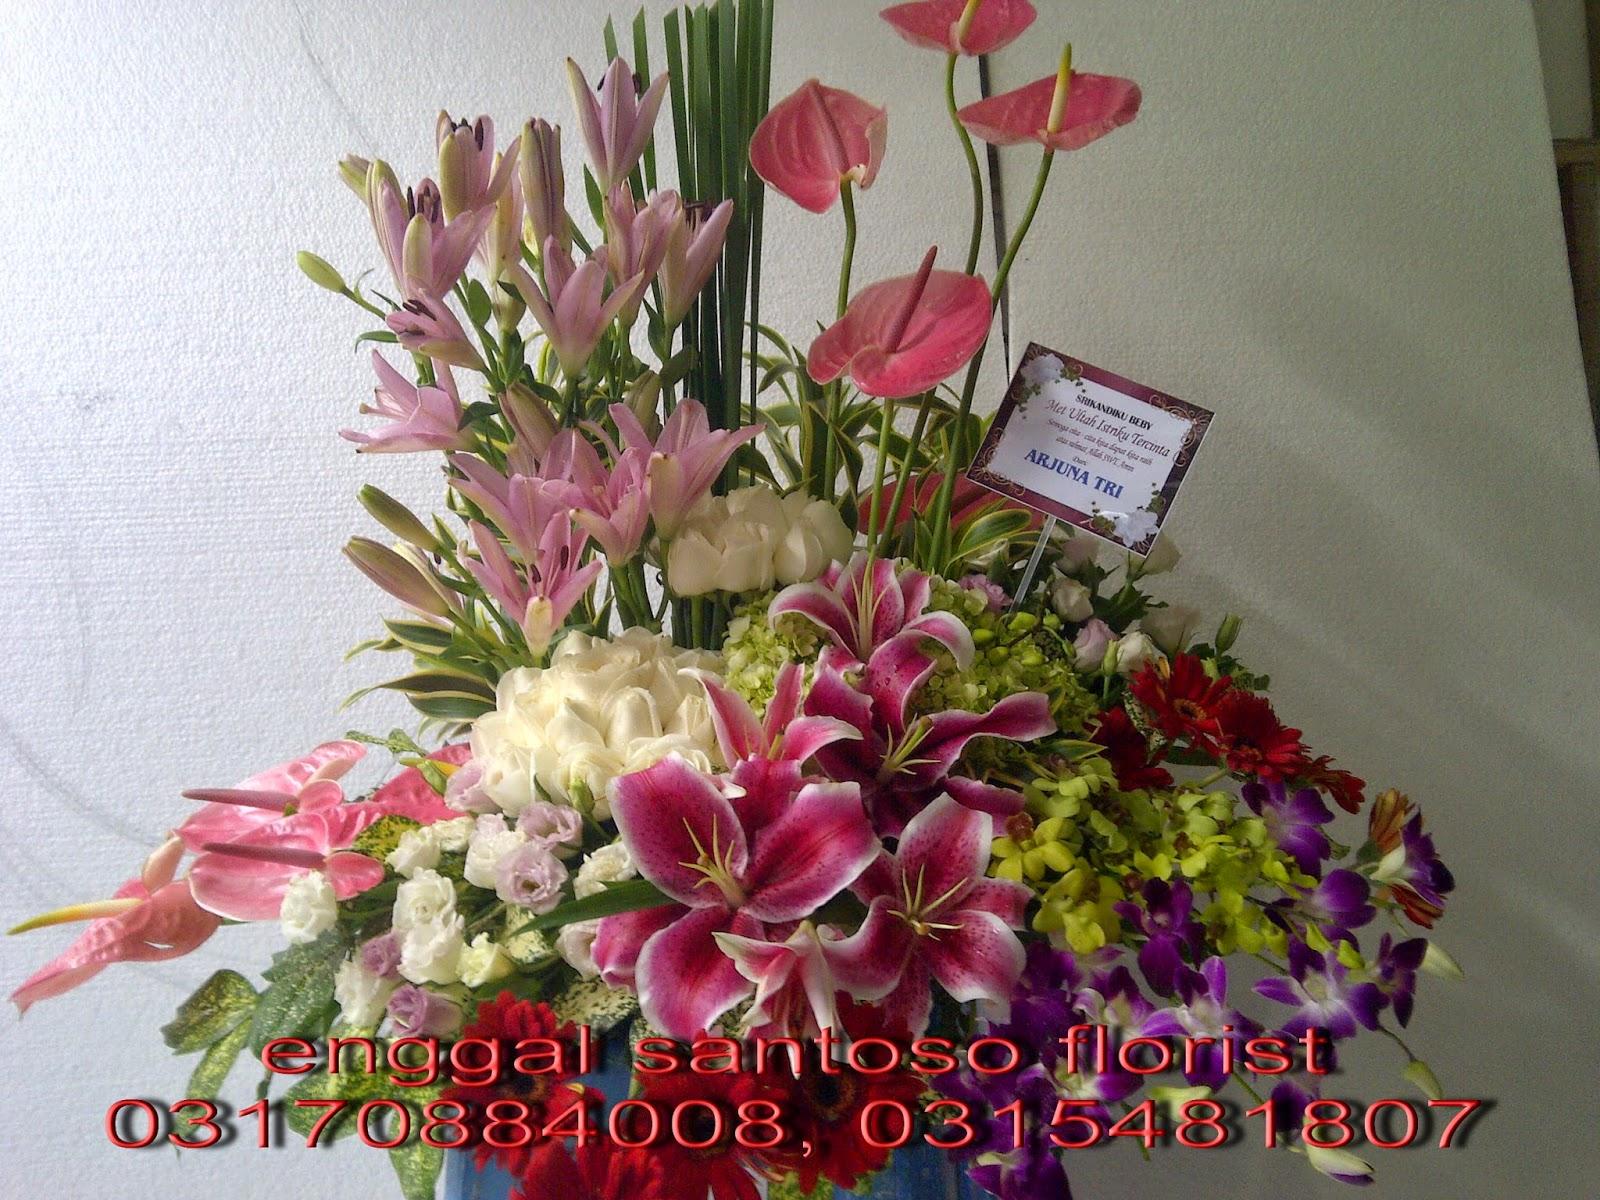 rangkaian karangan bunga meja tiger lily